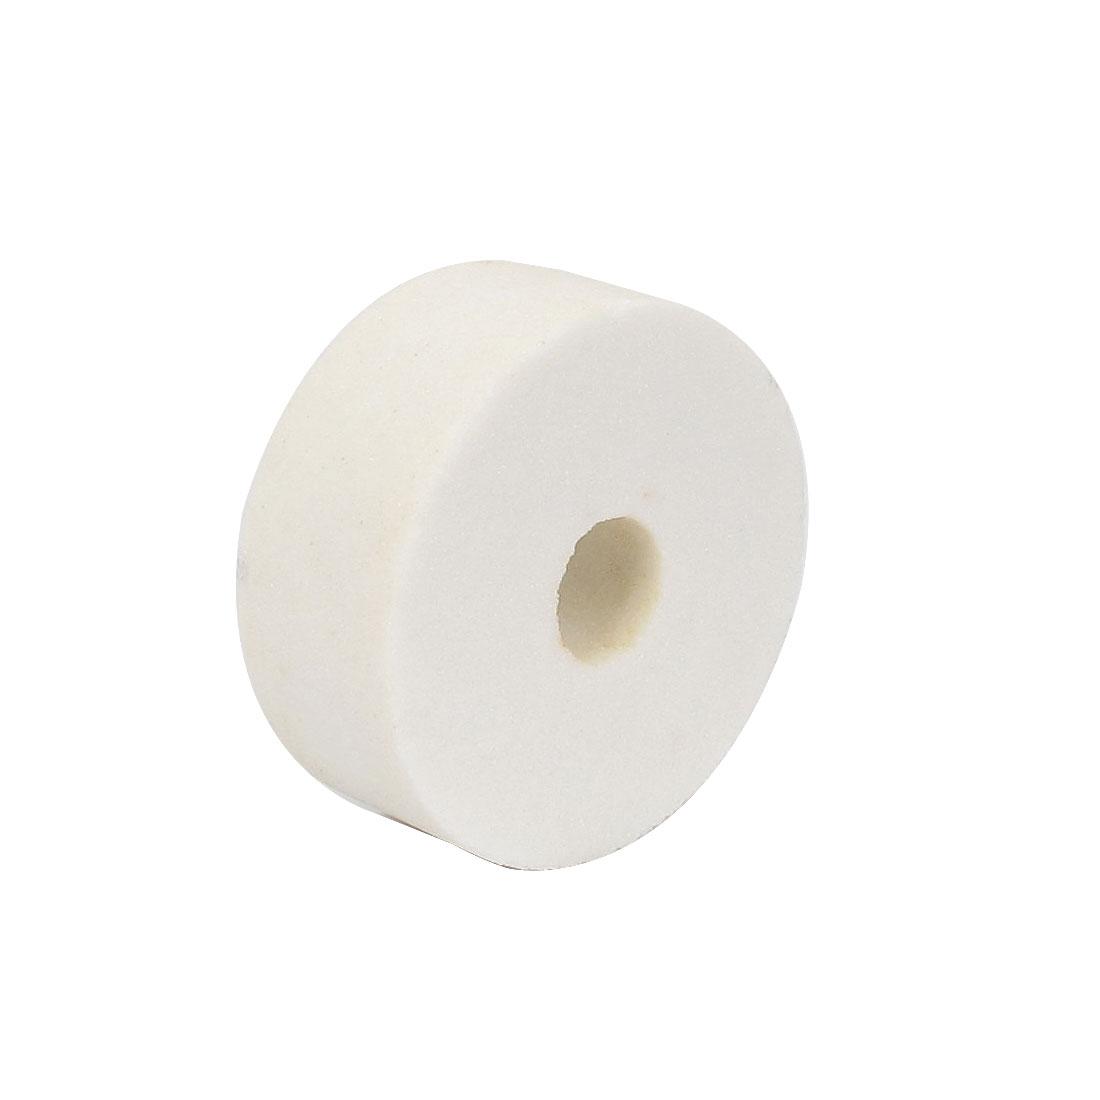 Carborundum Abrasives Round Grinding Wheel White 80 x 32 x 20mm